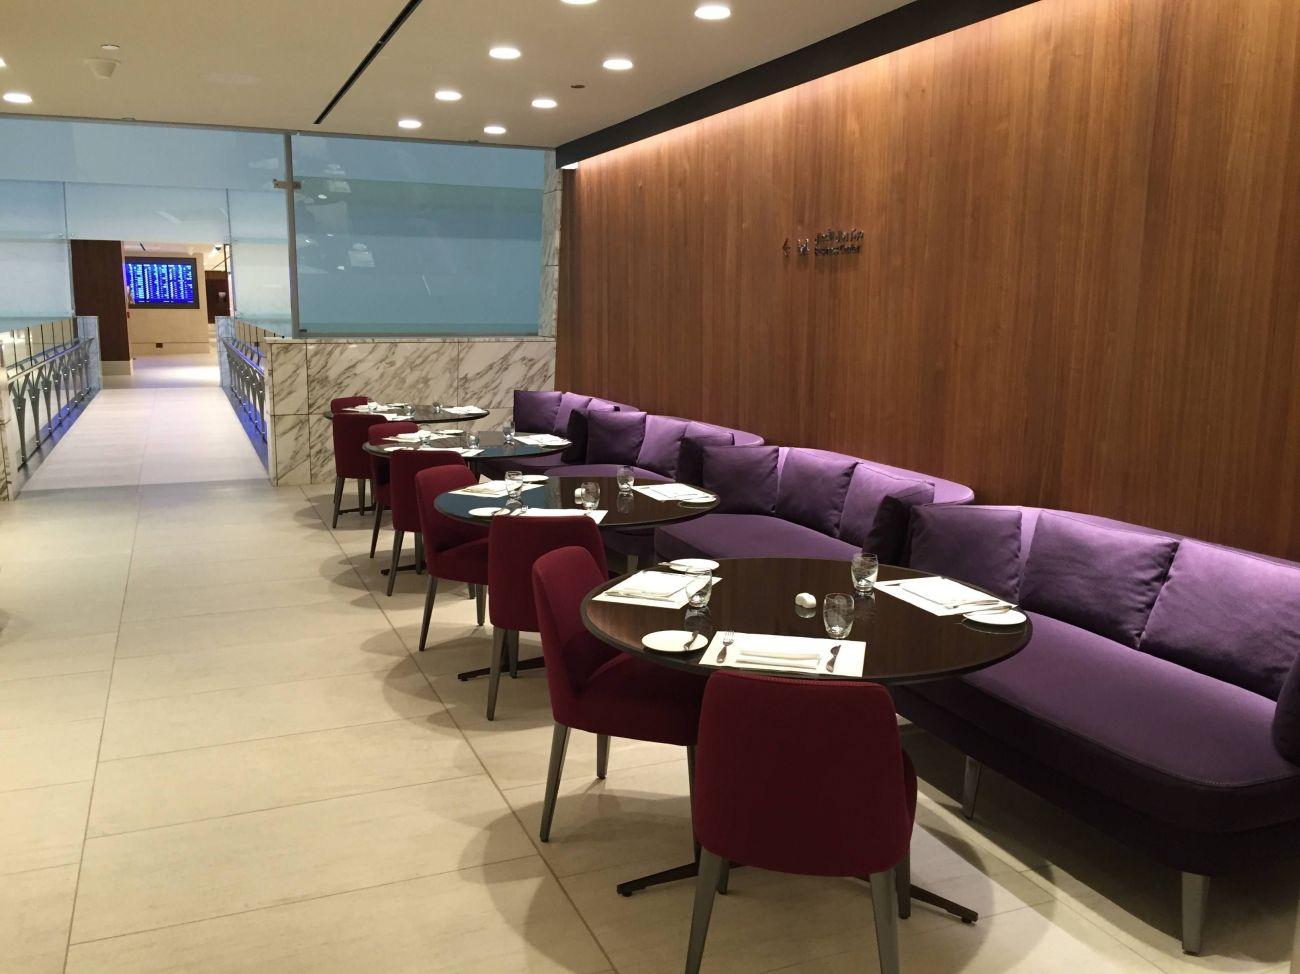 qatar airways arrival lounge